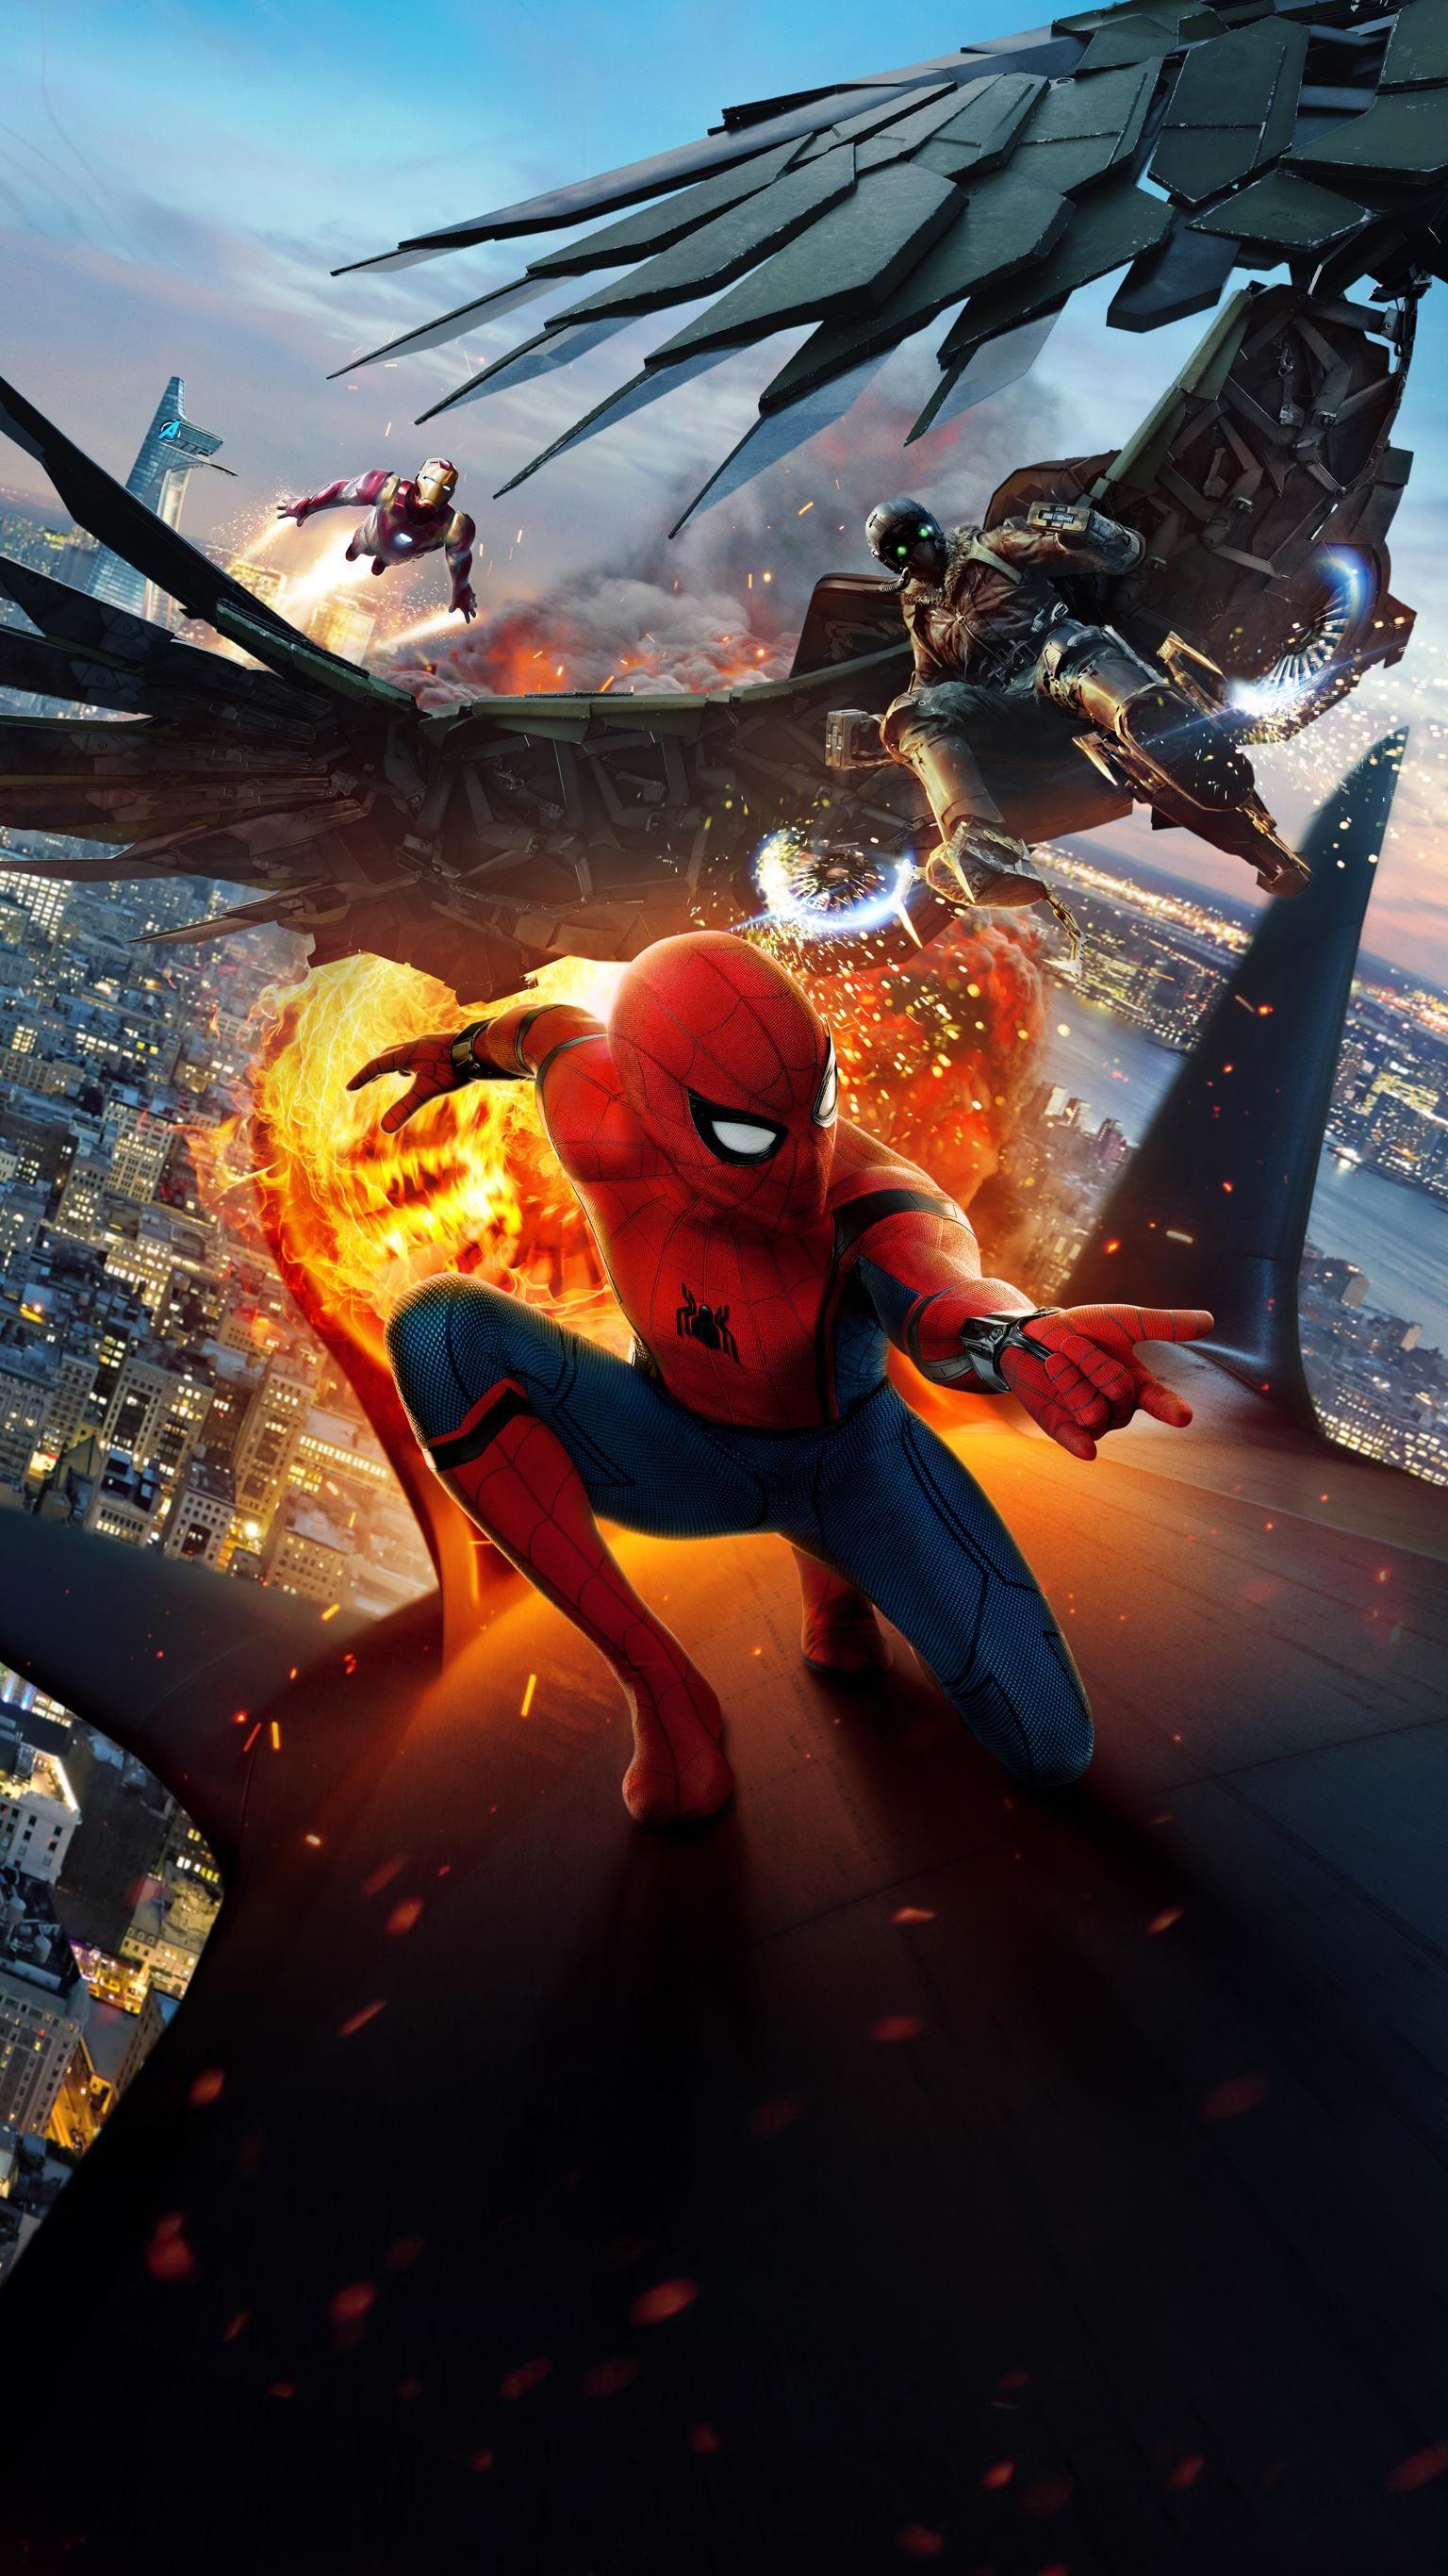 Spider Man Homecoming 2017 Phone Wallpaper Homem Aranha 1536x2732